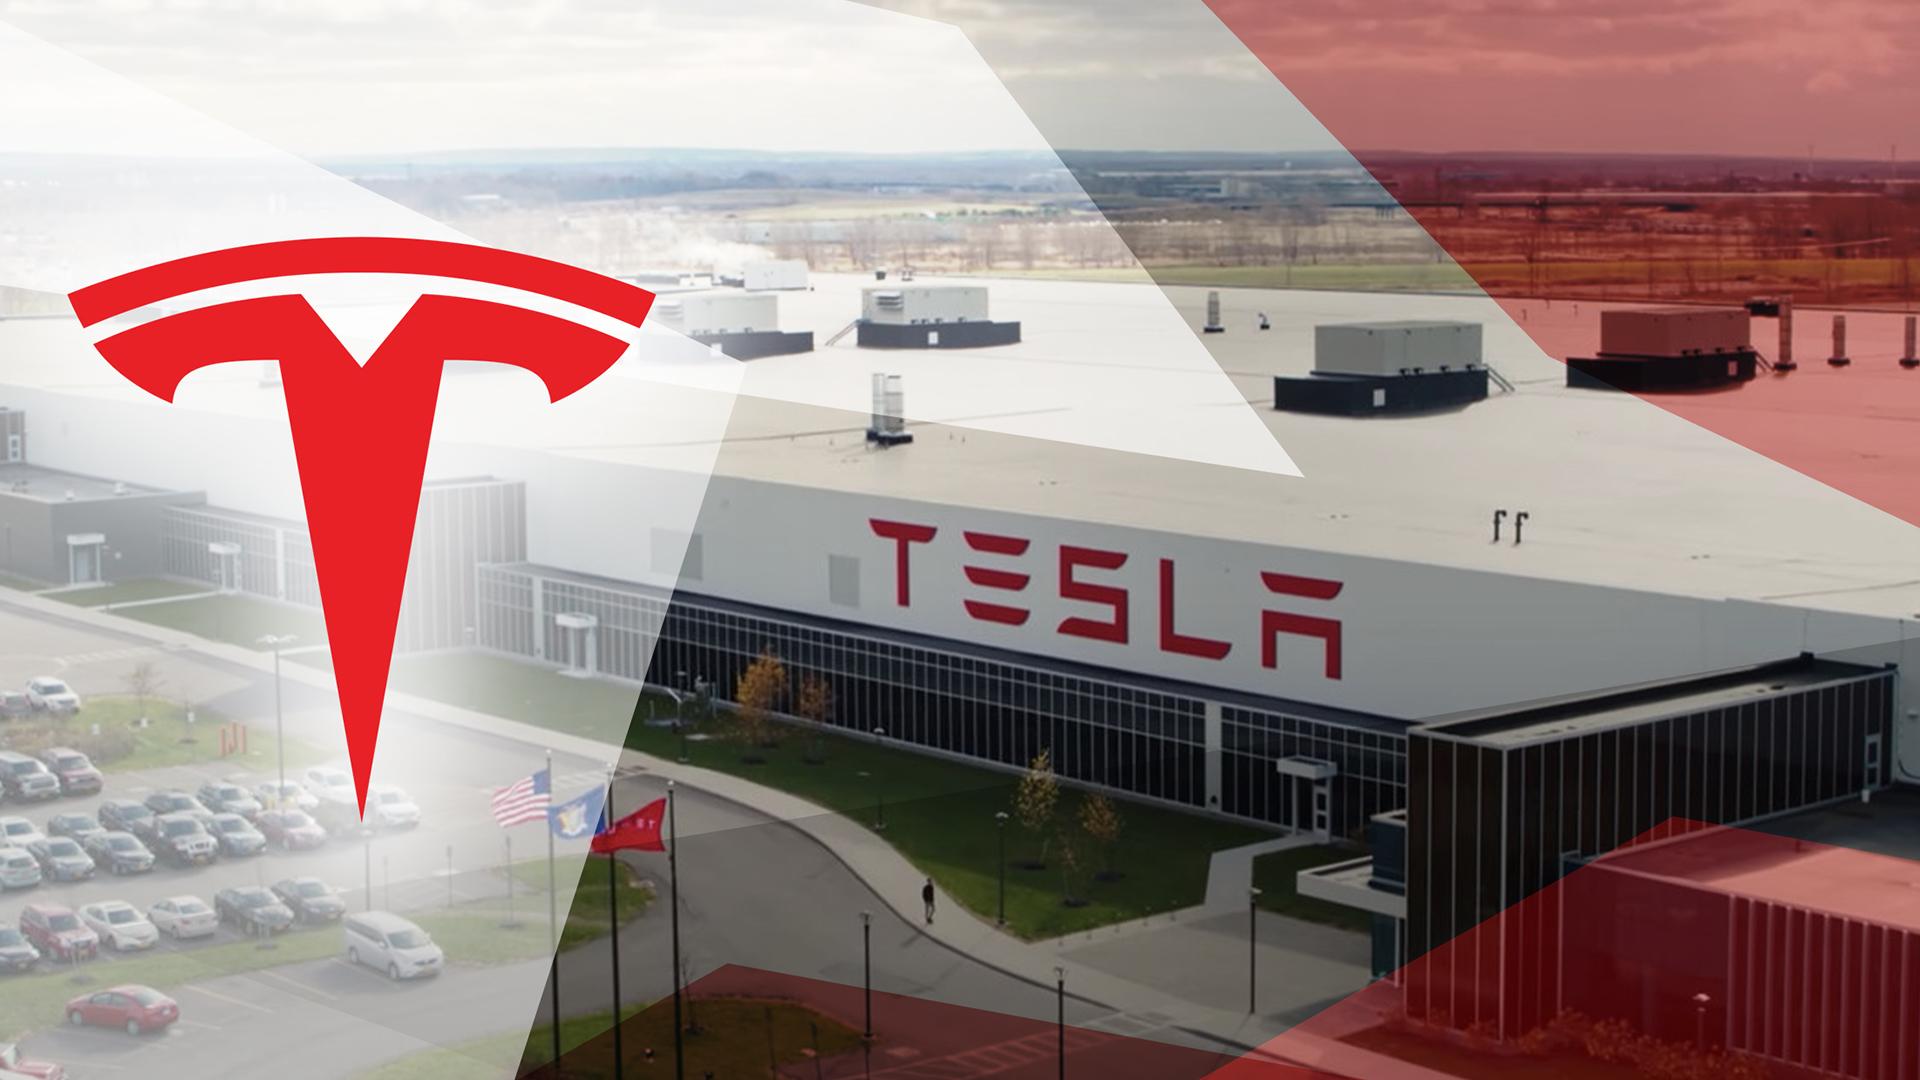 tesla, Tesla Motors, Fabrik, Gigafactory, Grünheide, Nevada, Gigafactory 4, Giga Berlin, Tesla Fabrik, Freienbrink, Tesla Brandenburg